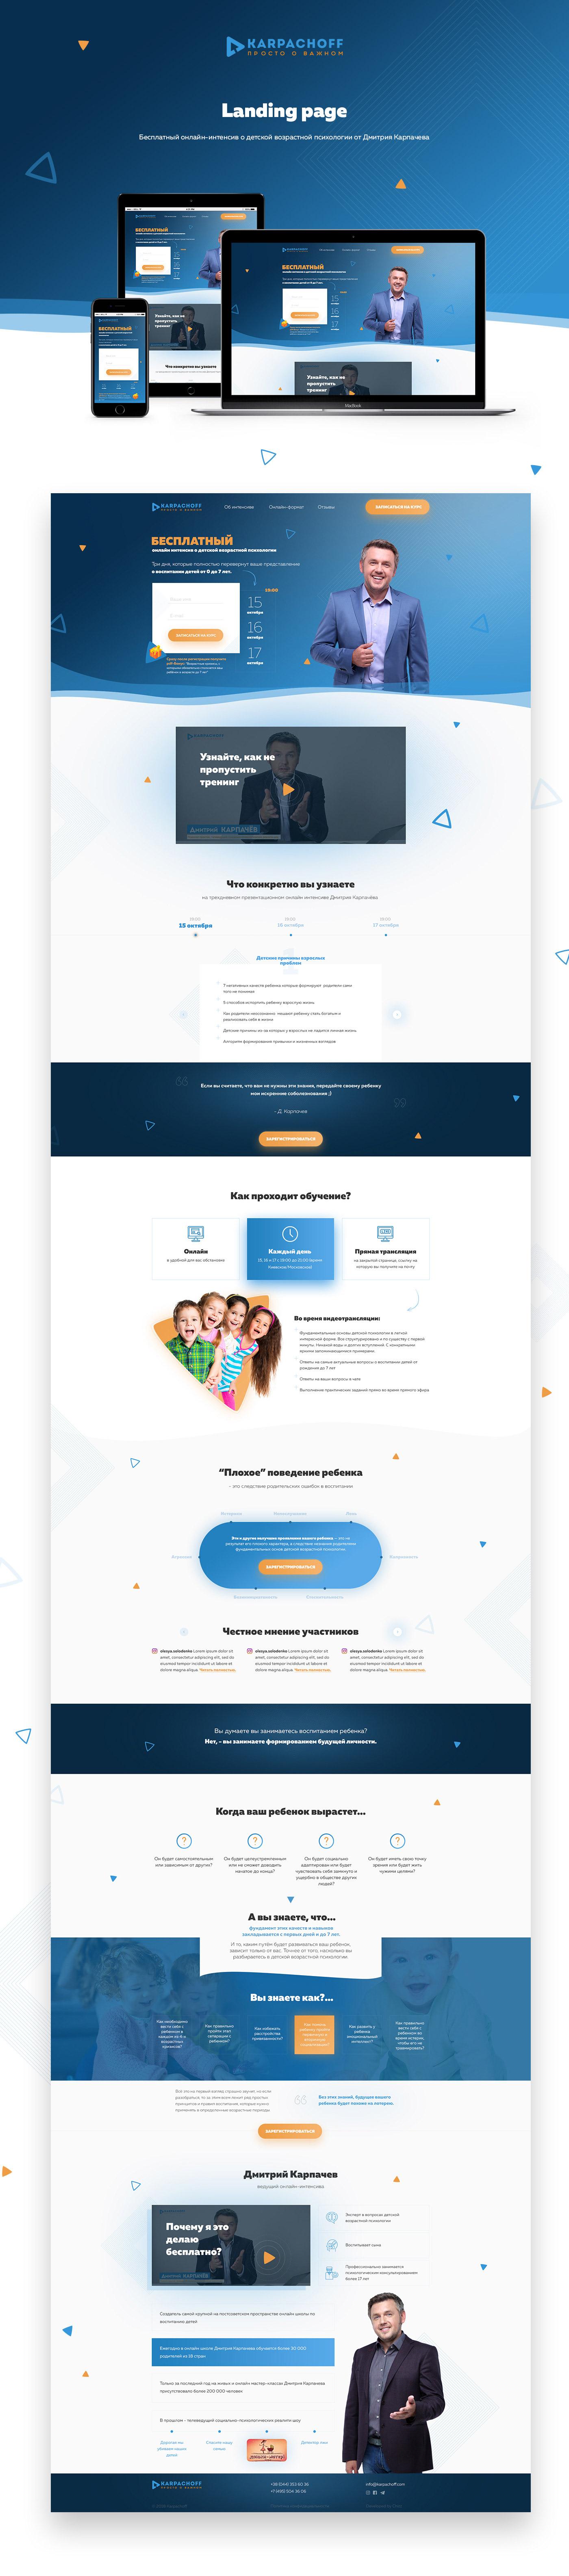 landing Web Design  design trends karpachoff 2019 Trends UI ux Coach for children blue